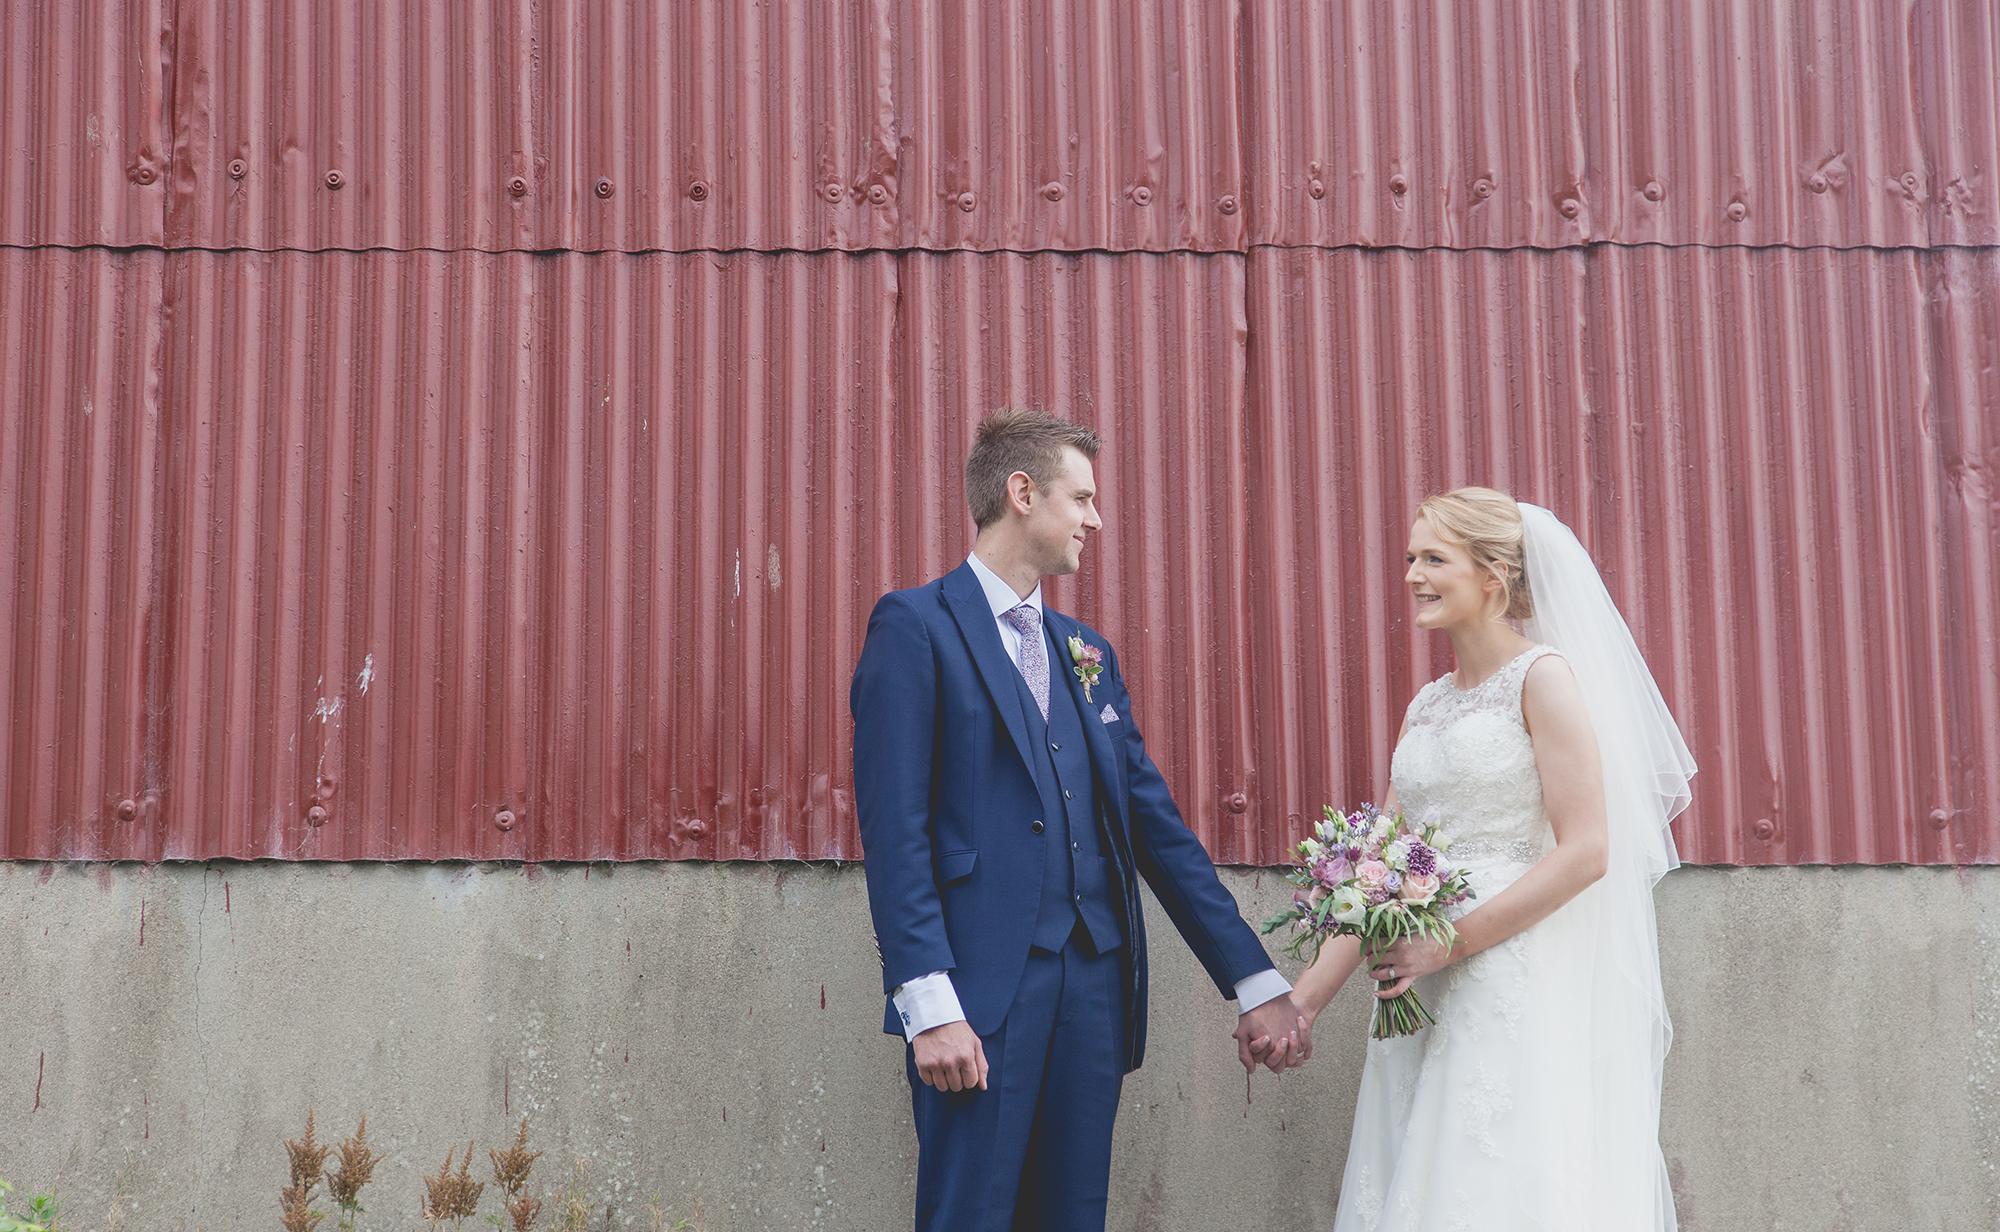 ballygally wedding photography tc photography larne belfast lisburn 19